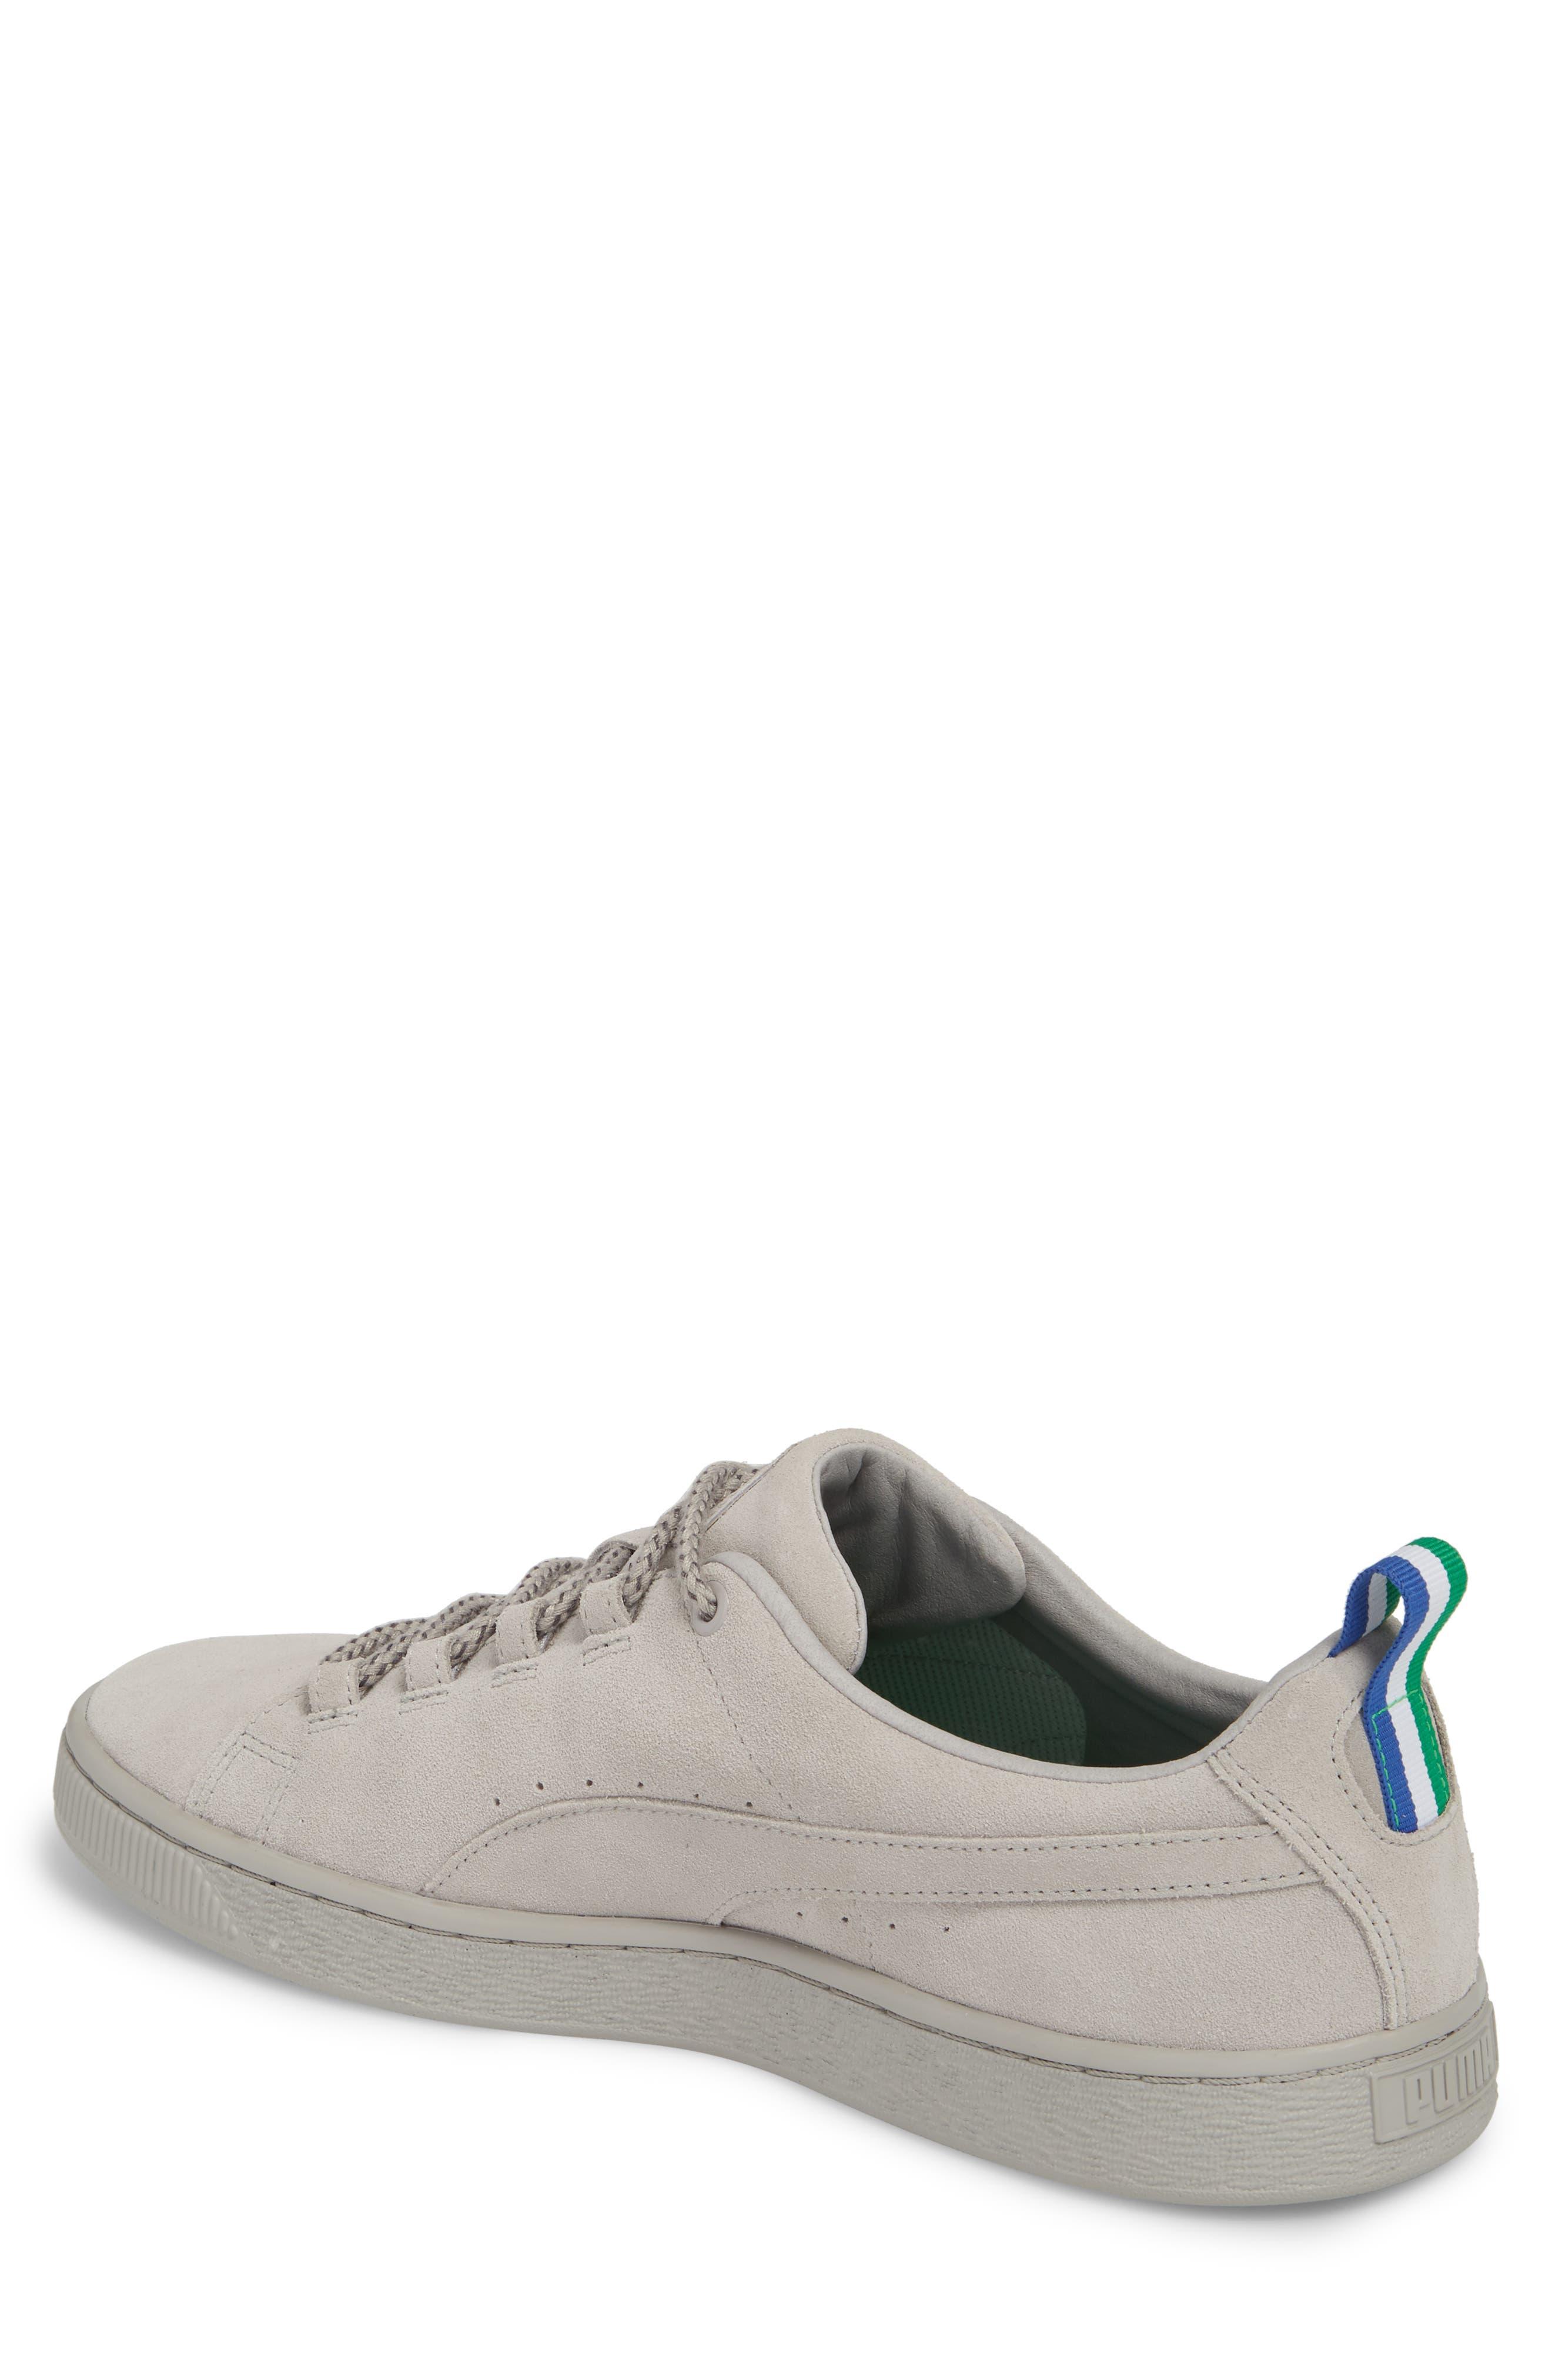 x Big Sean Suede Sneaker,                             Alternate thumbnail 2, color,                             060